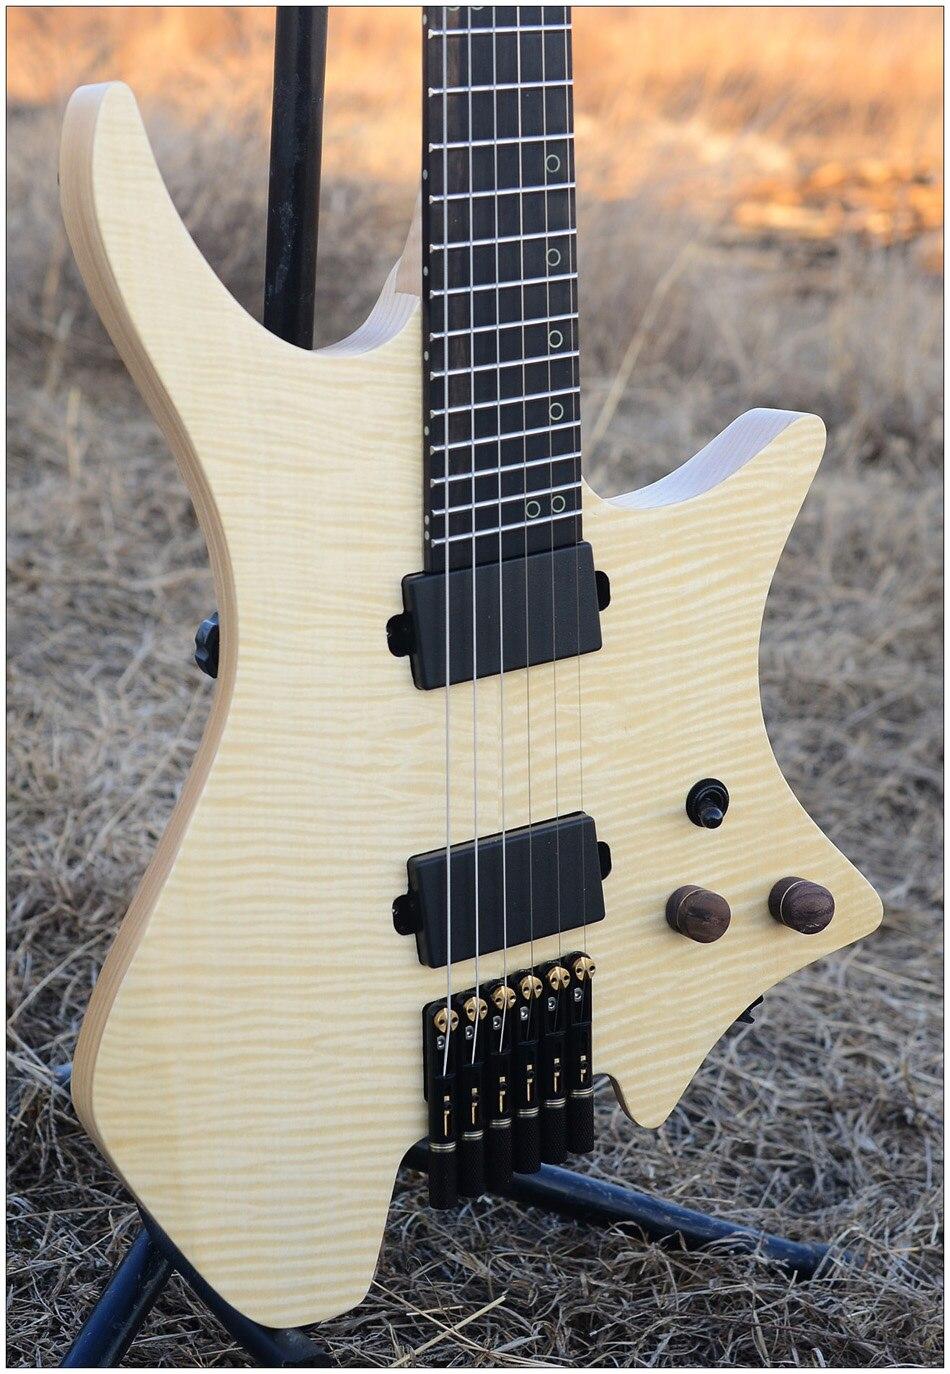 2019 NK Headless Fanned Frets Electric guitar clear Flame Maple top Flame maple Neck Ebony fingerboard Black hardware Guitar